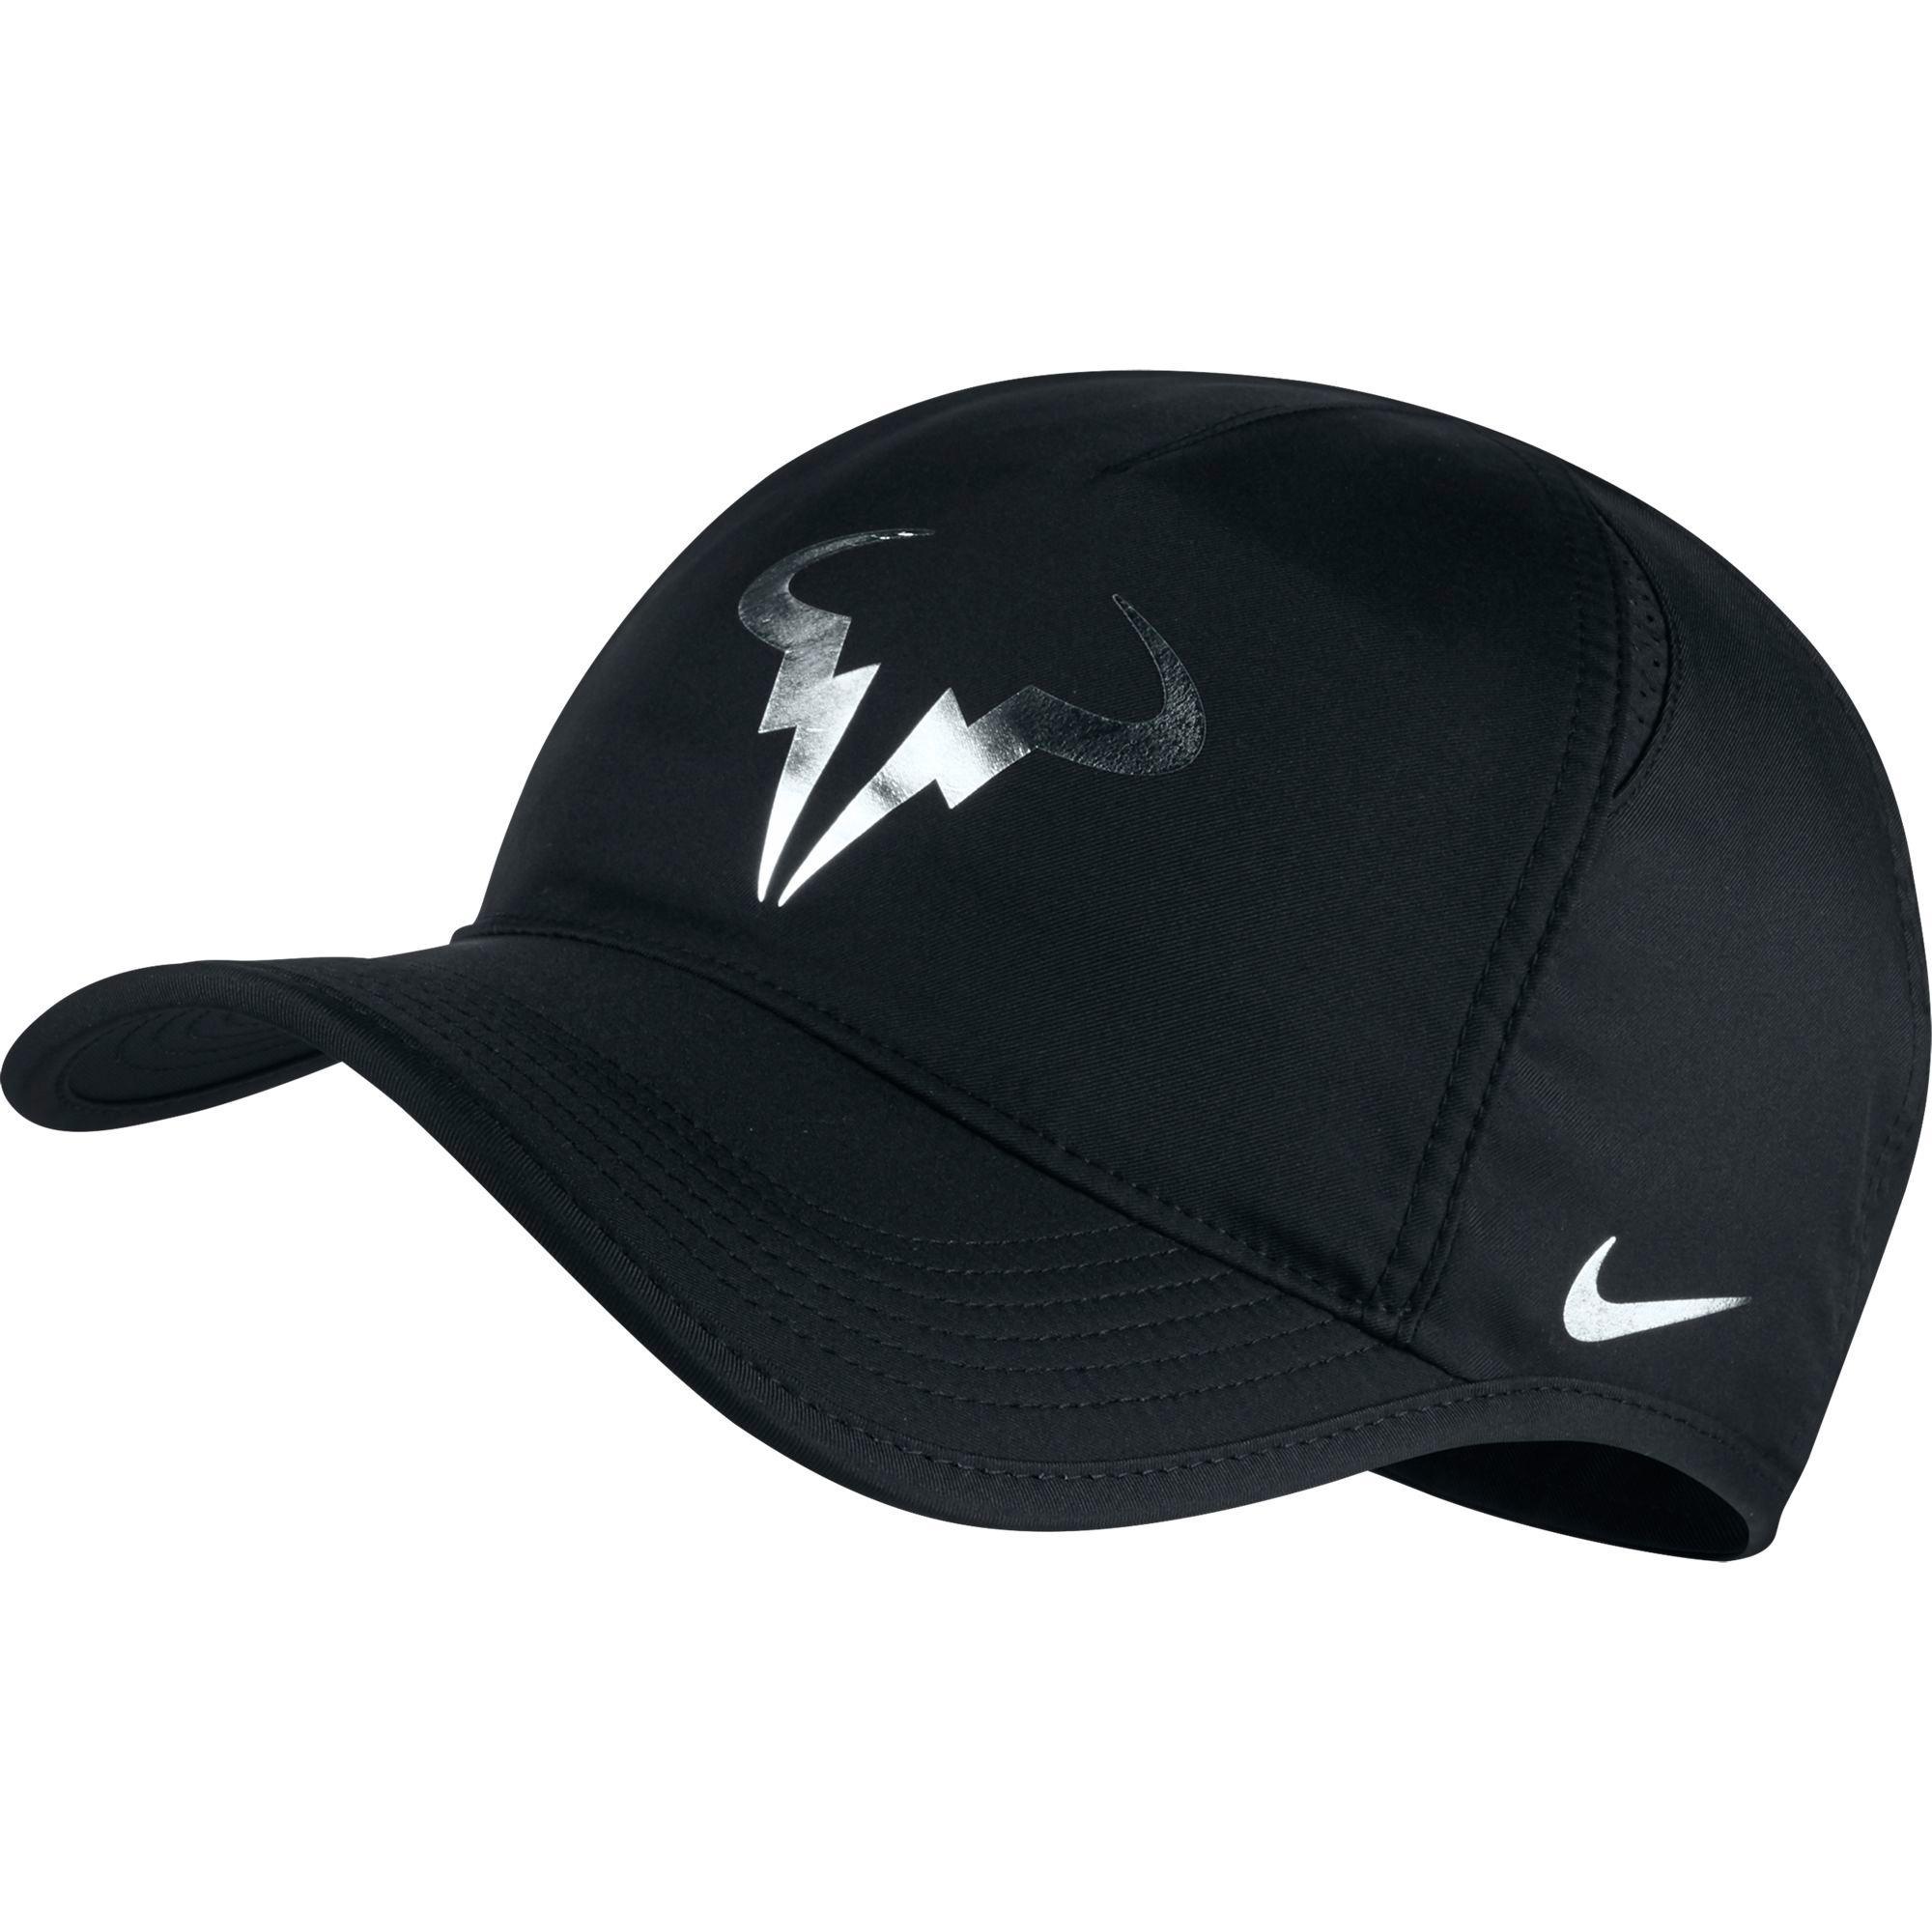 7ce1d1c0402 Nike Rafa Feather Light Adjustable Cap - Black - Tennisnuts.com